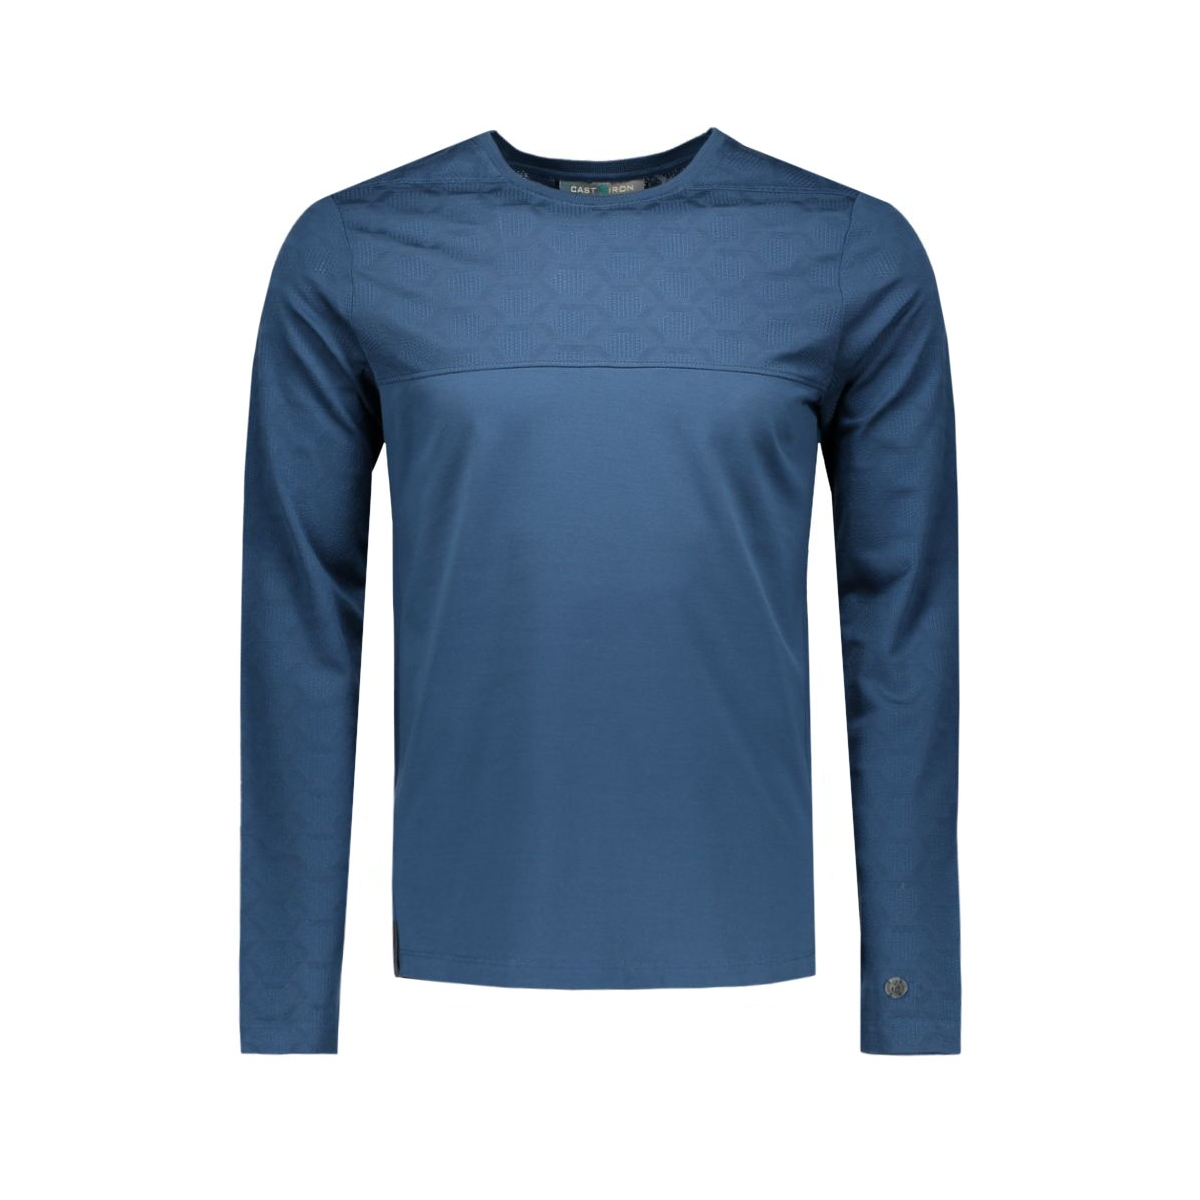 cts65305 cast iron t-shirt 5955